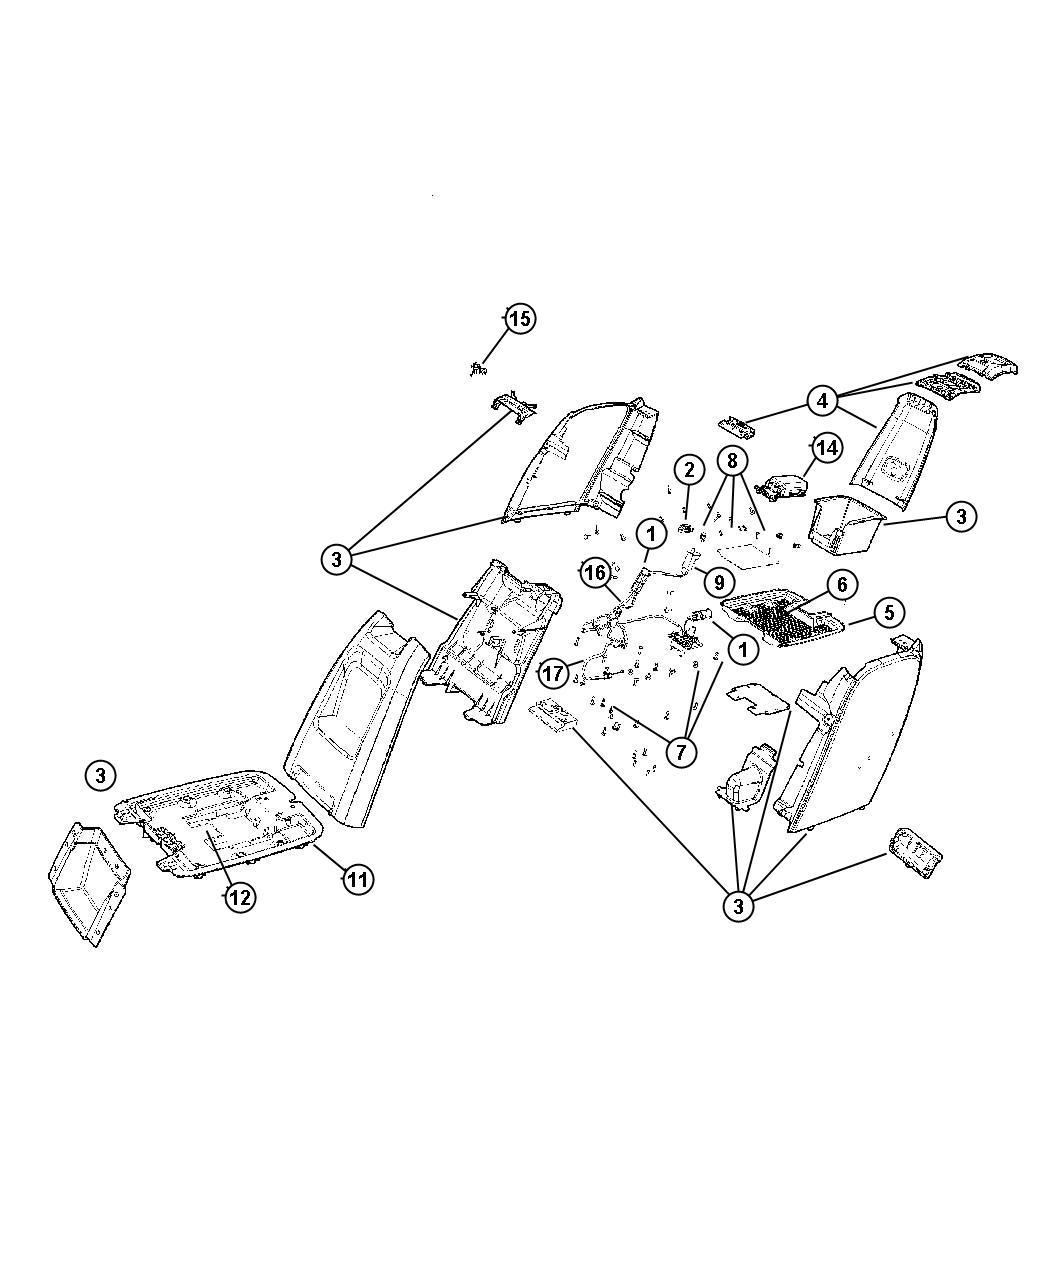 Dodge Caravan Bracket. Console, console tray. [removable